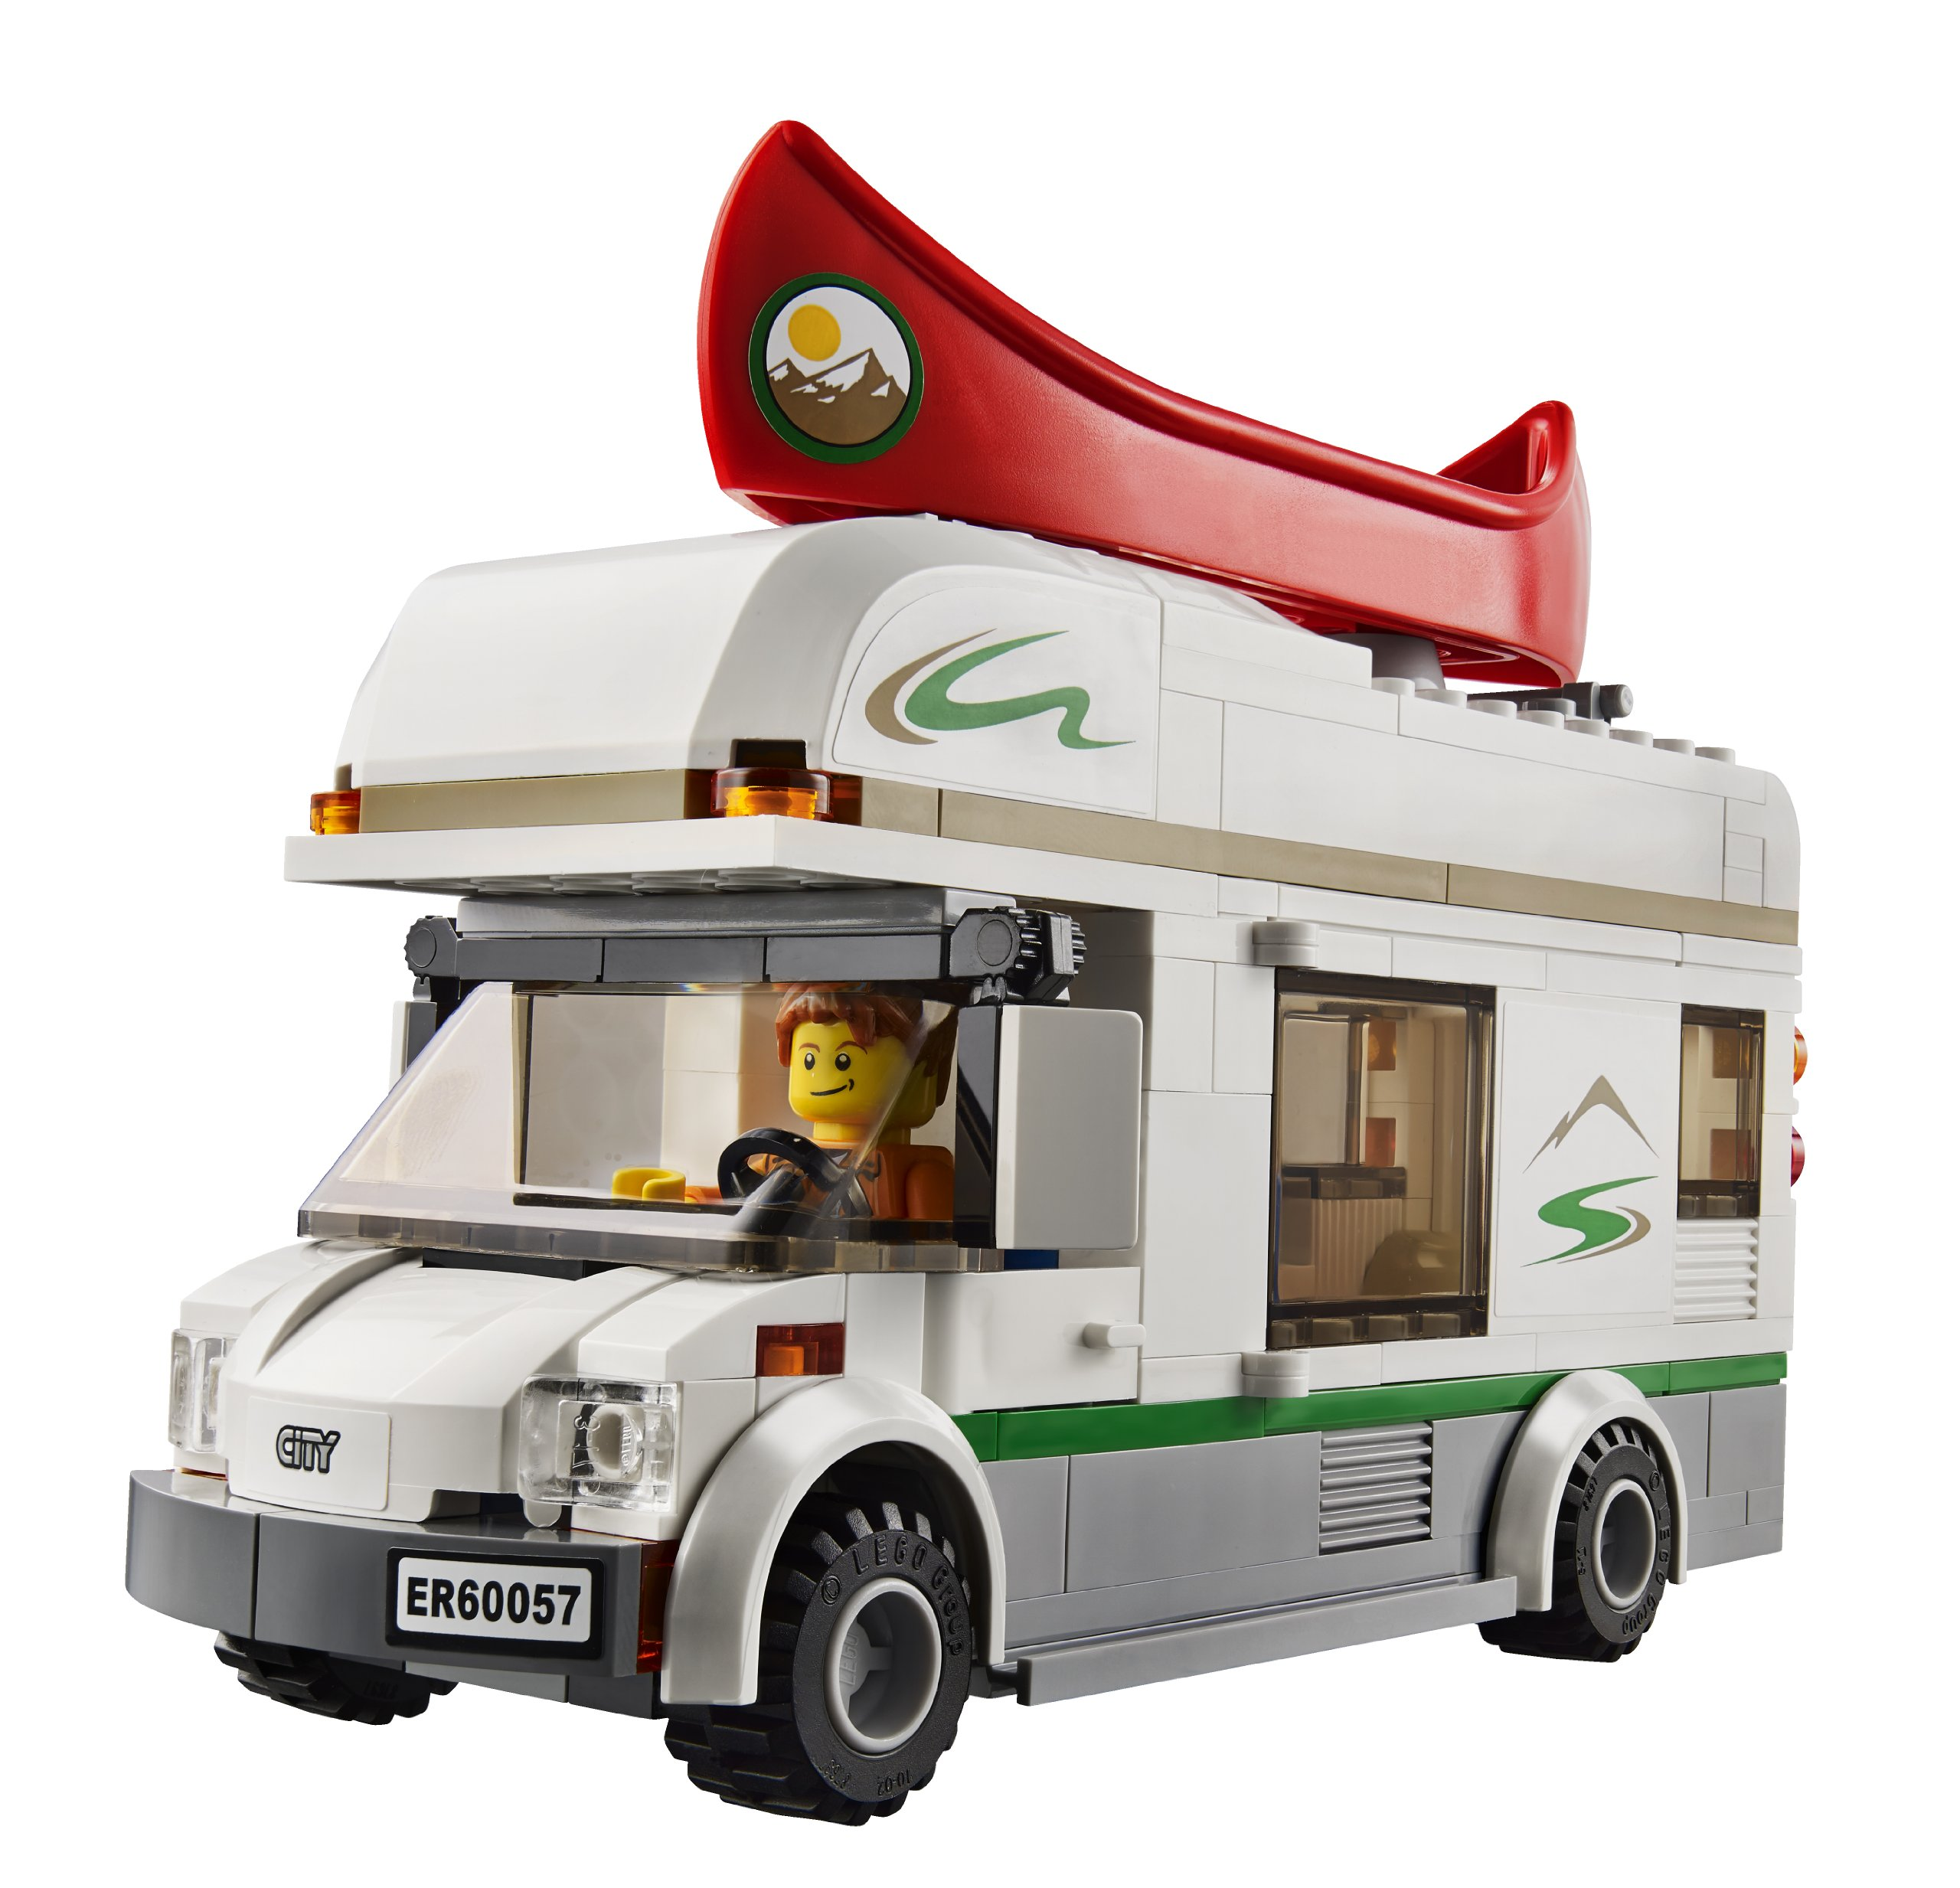 Retired 2014 #60057 NEW LEGO City Camper Van